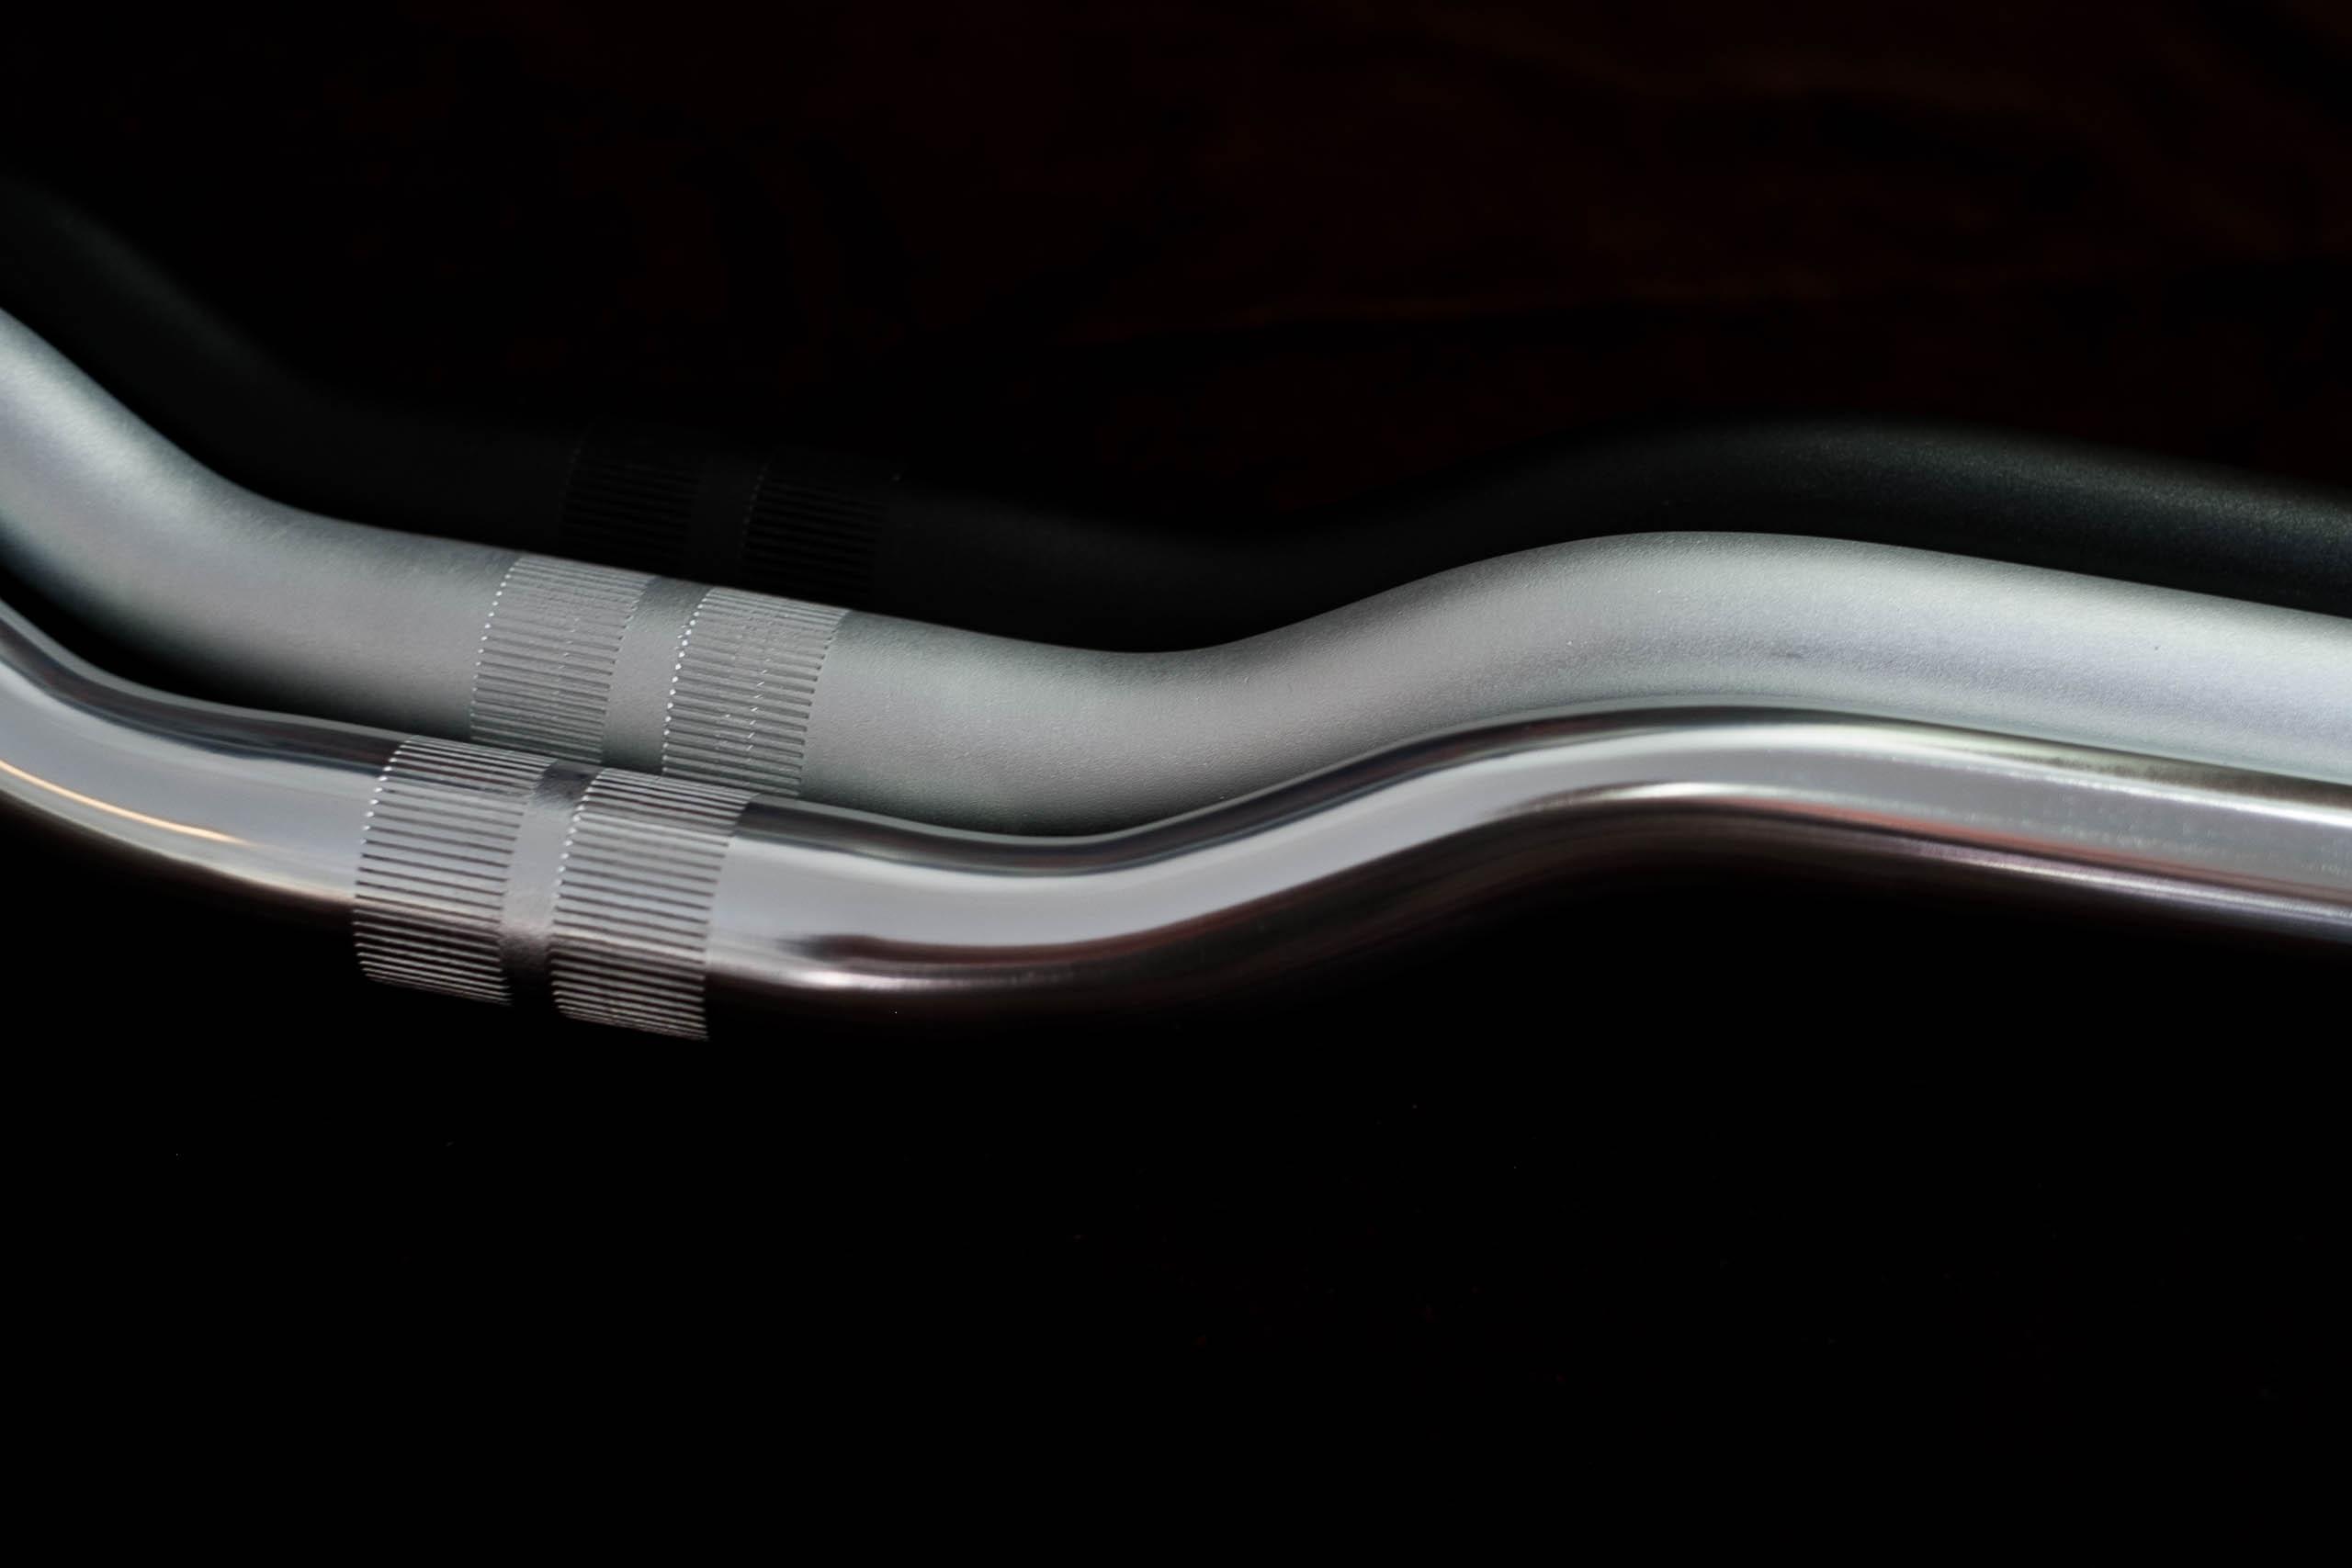 zkm 25,4 mm 60 cm gerade Riser Bar Mountainbike Fahrrad Aluminiumlegierung Lenker Schwarz